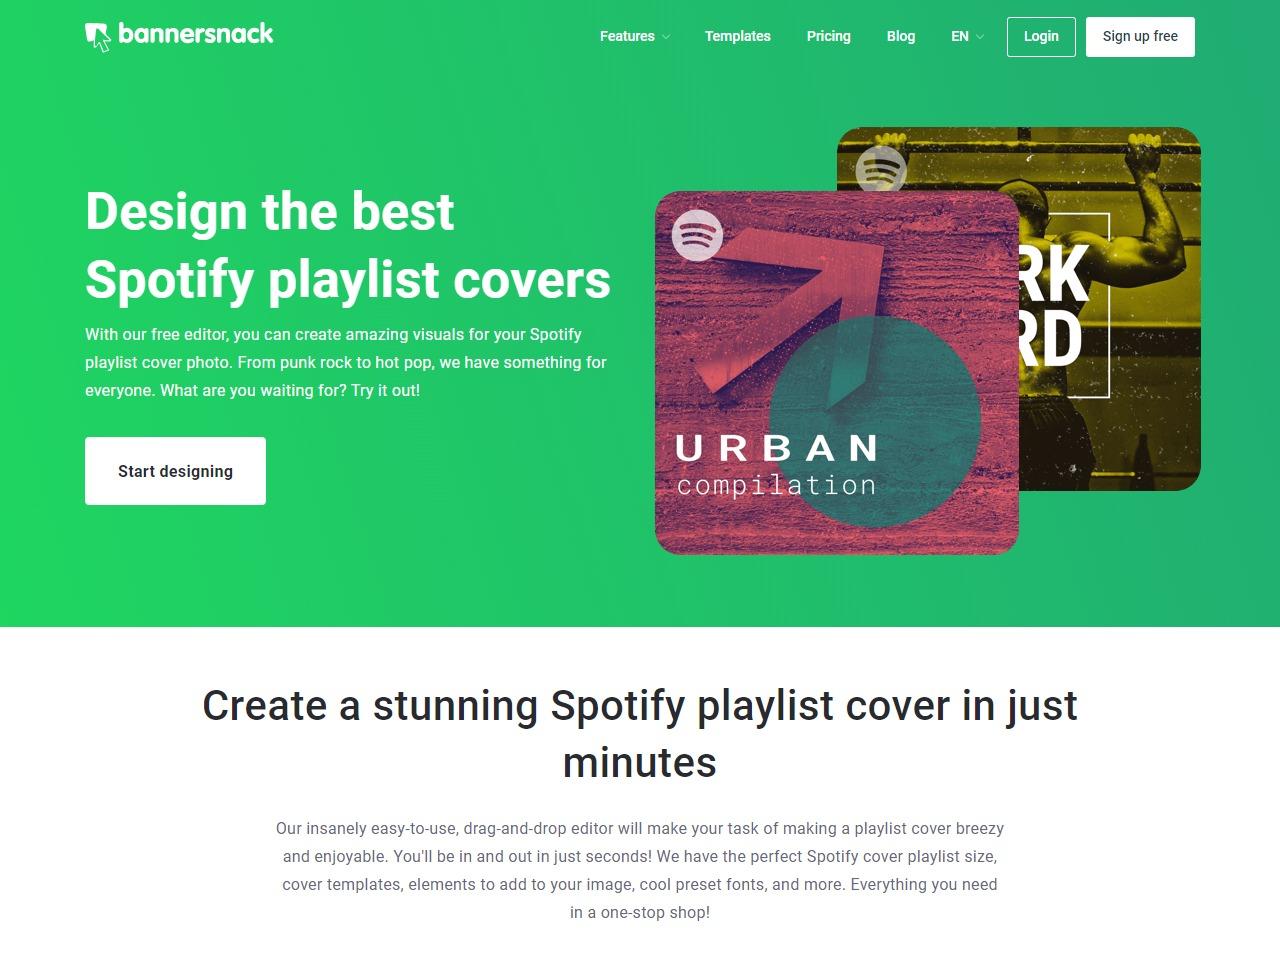 Bannersnack Playlist Cover Design Buzzsonic